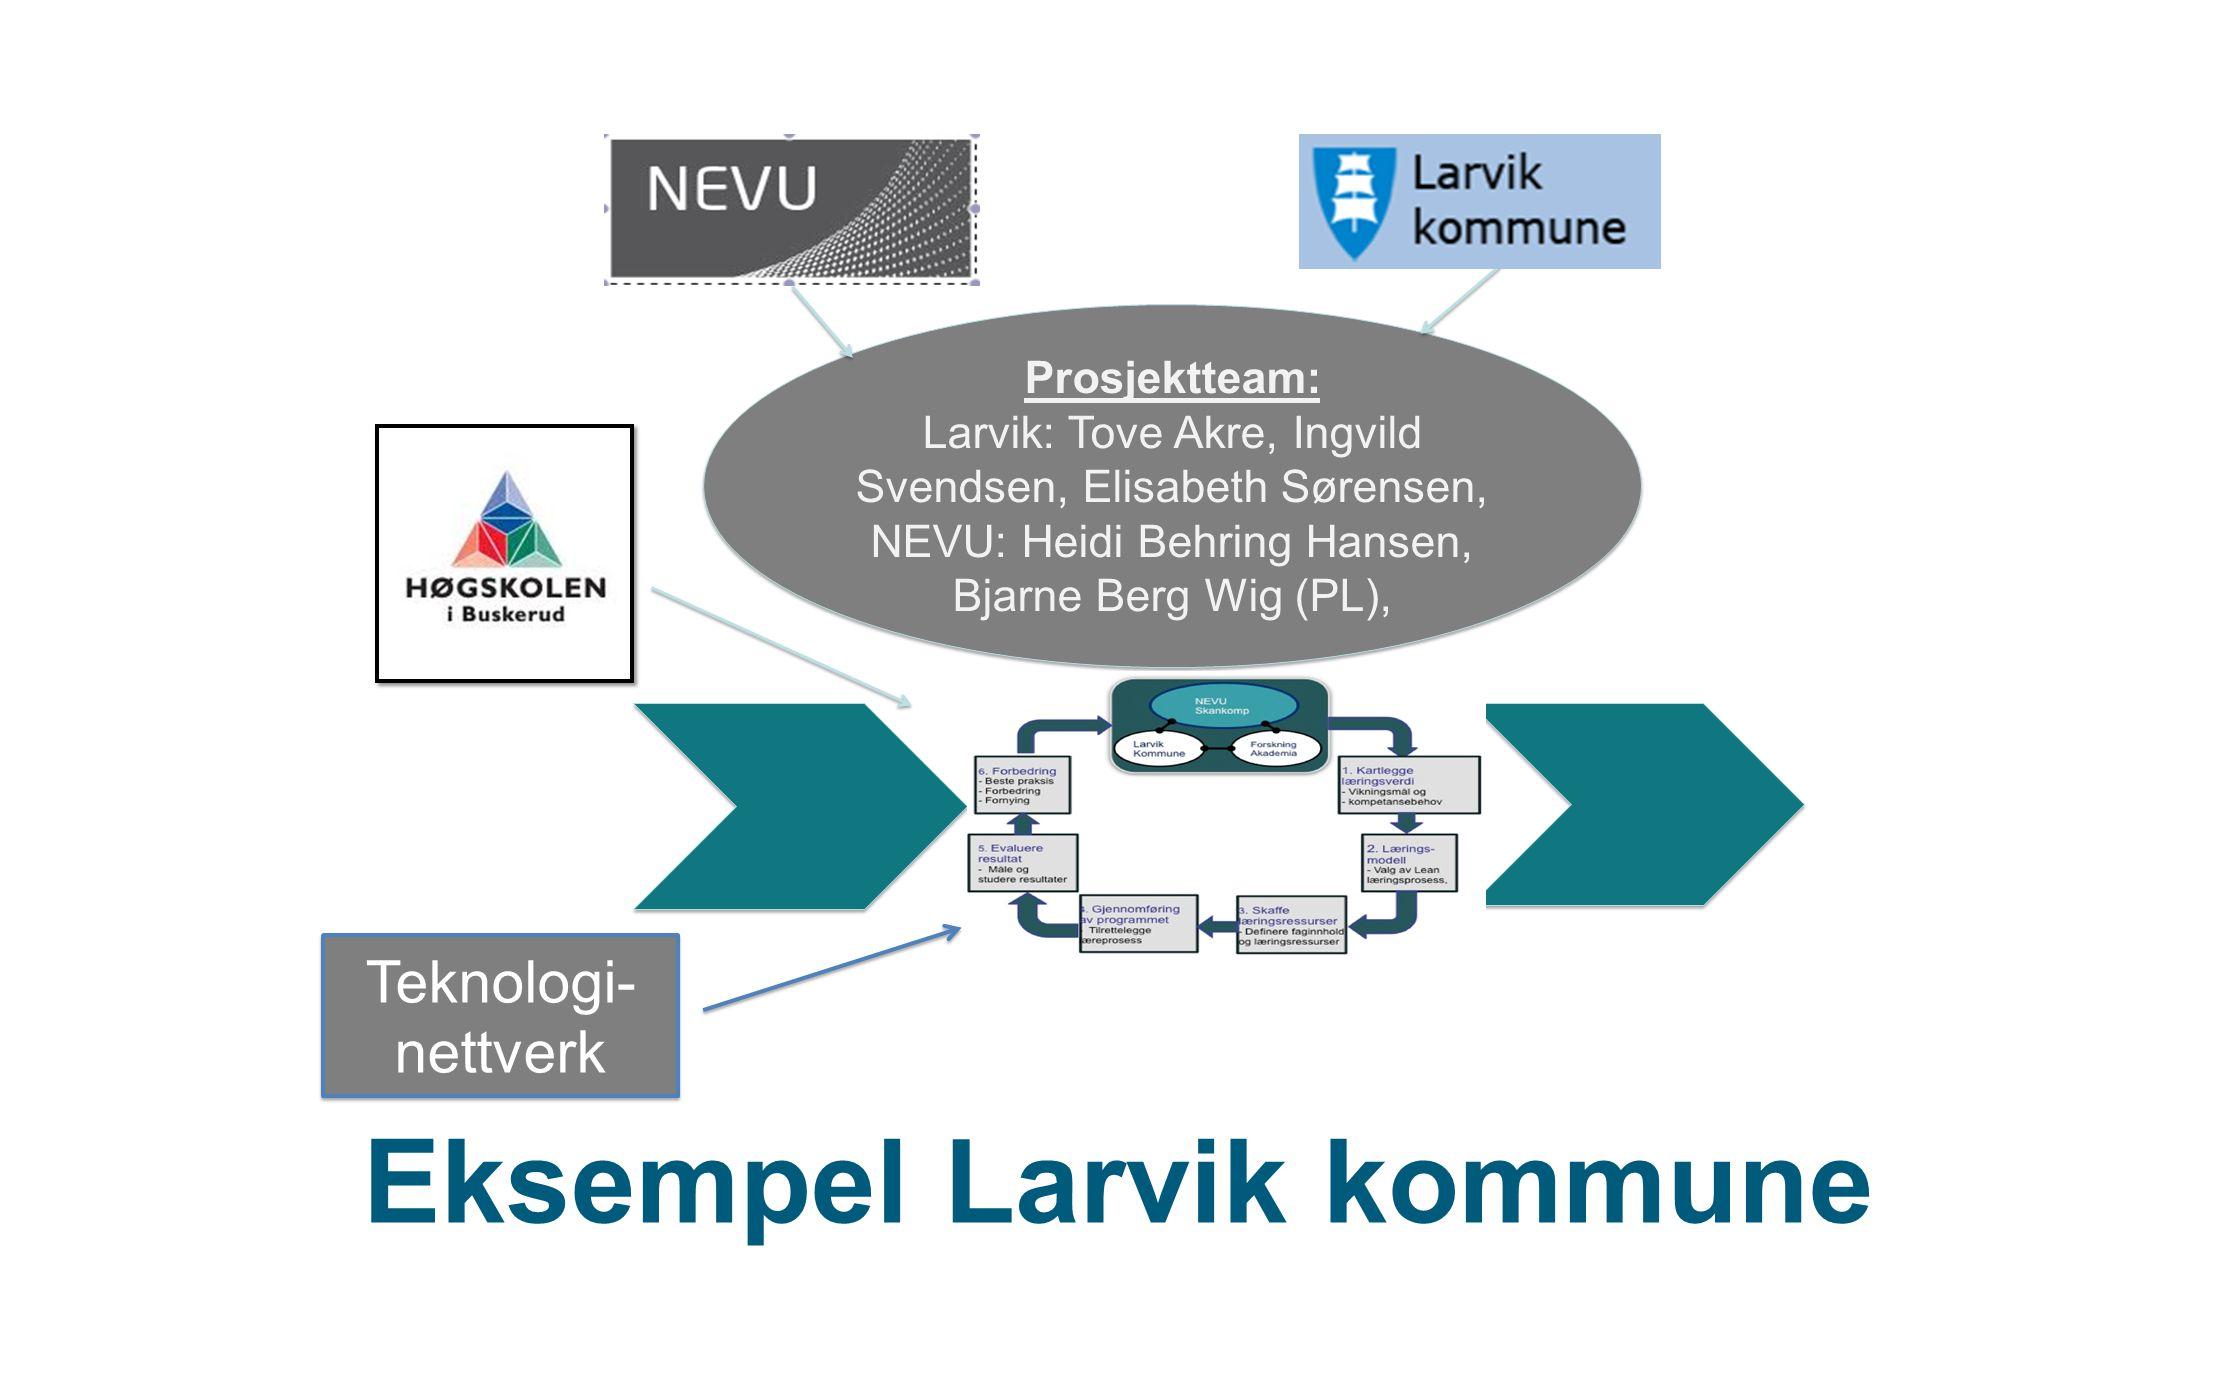 Eksempel Larvik kommune